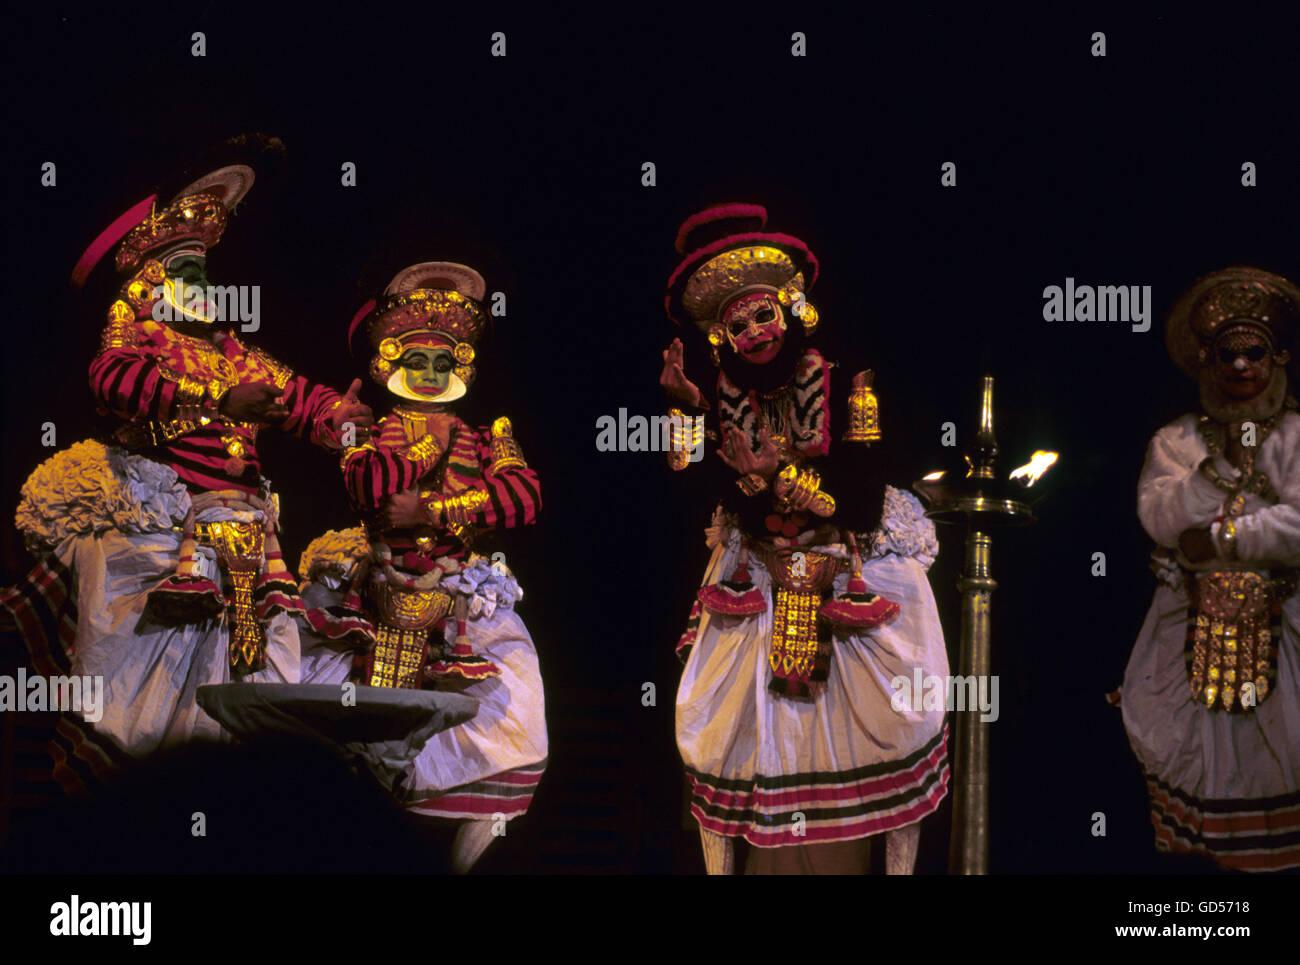 Folk artistes - Stock Image